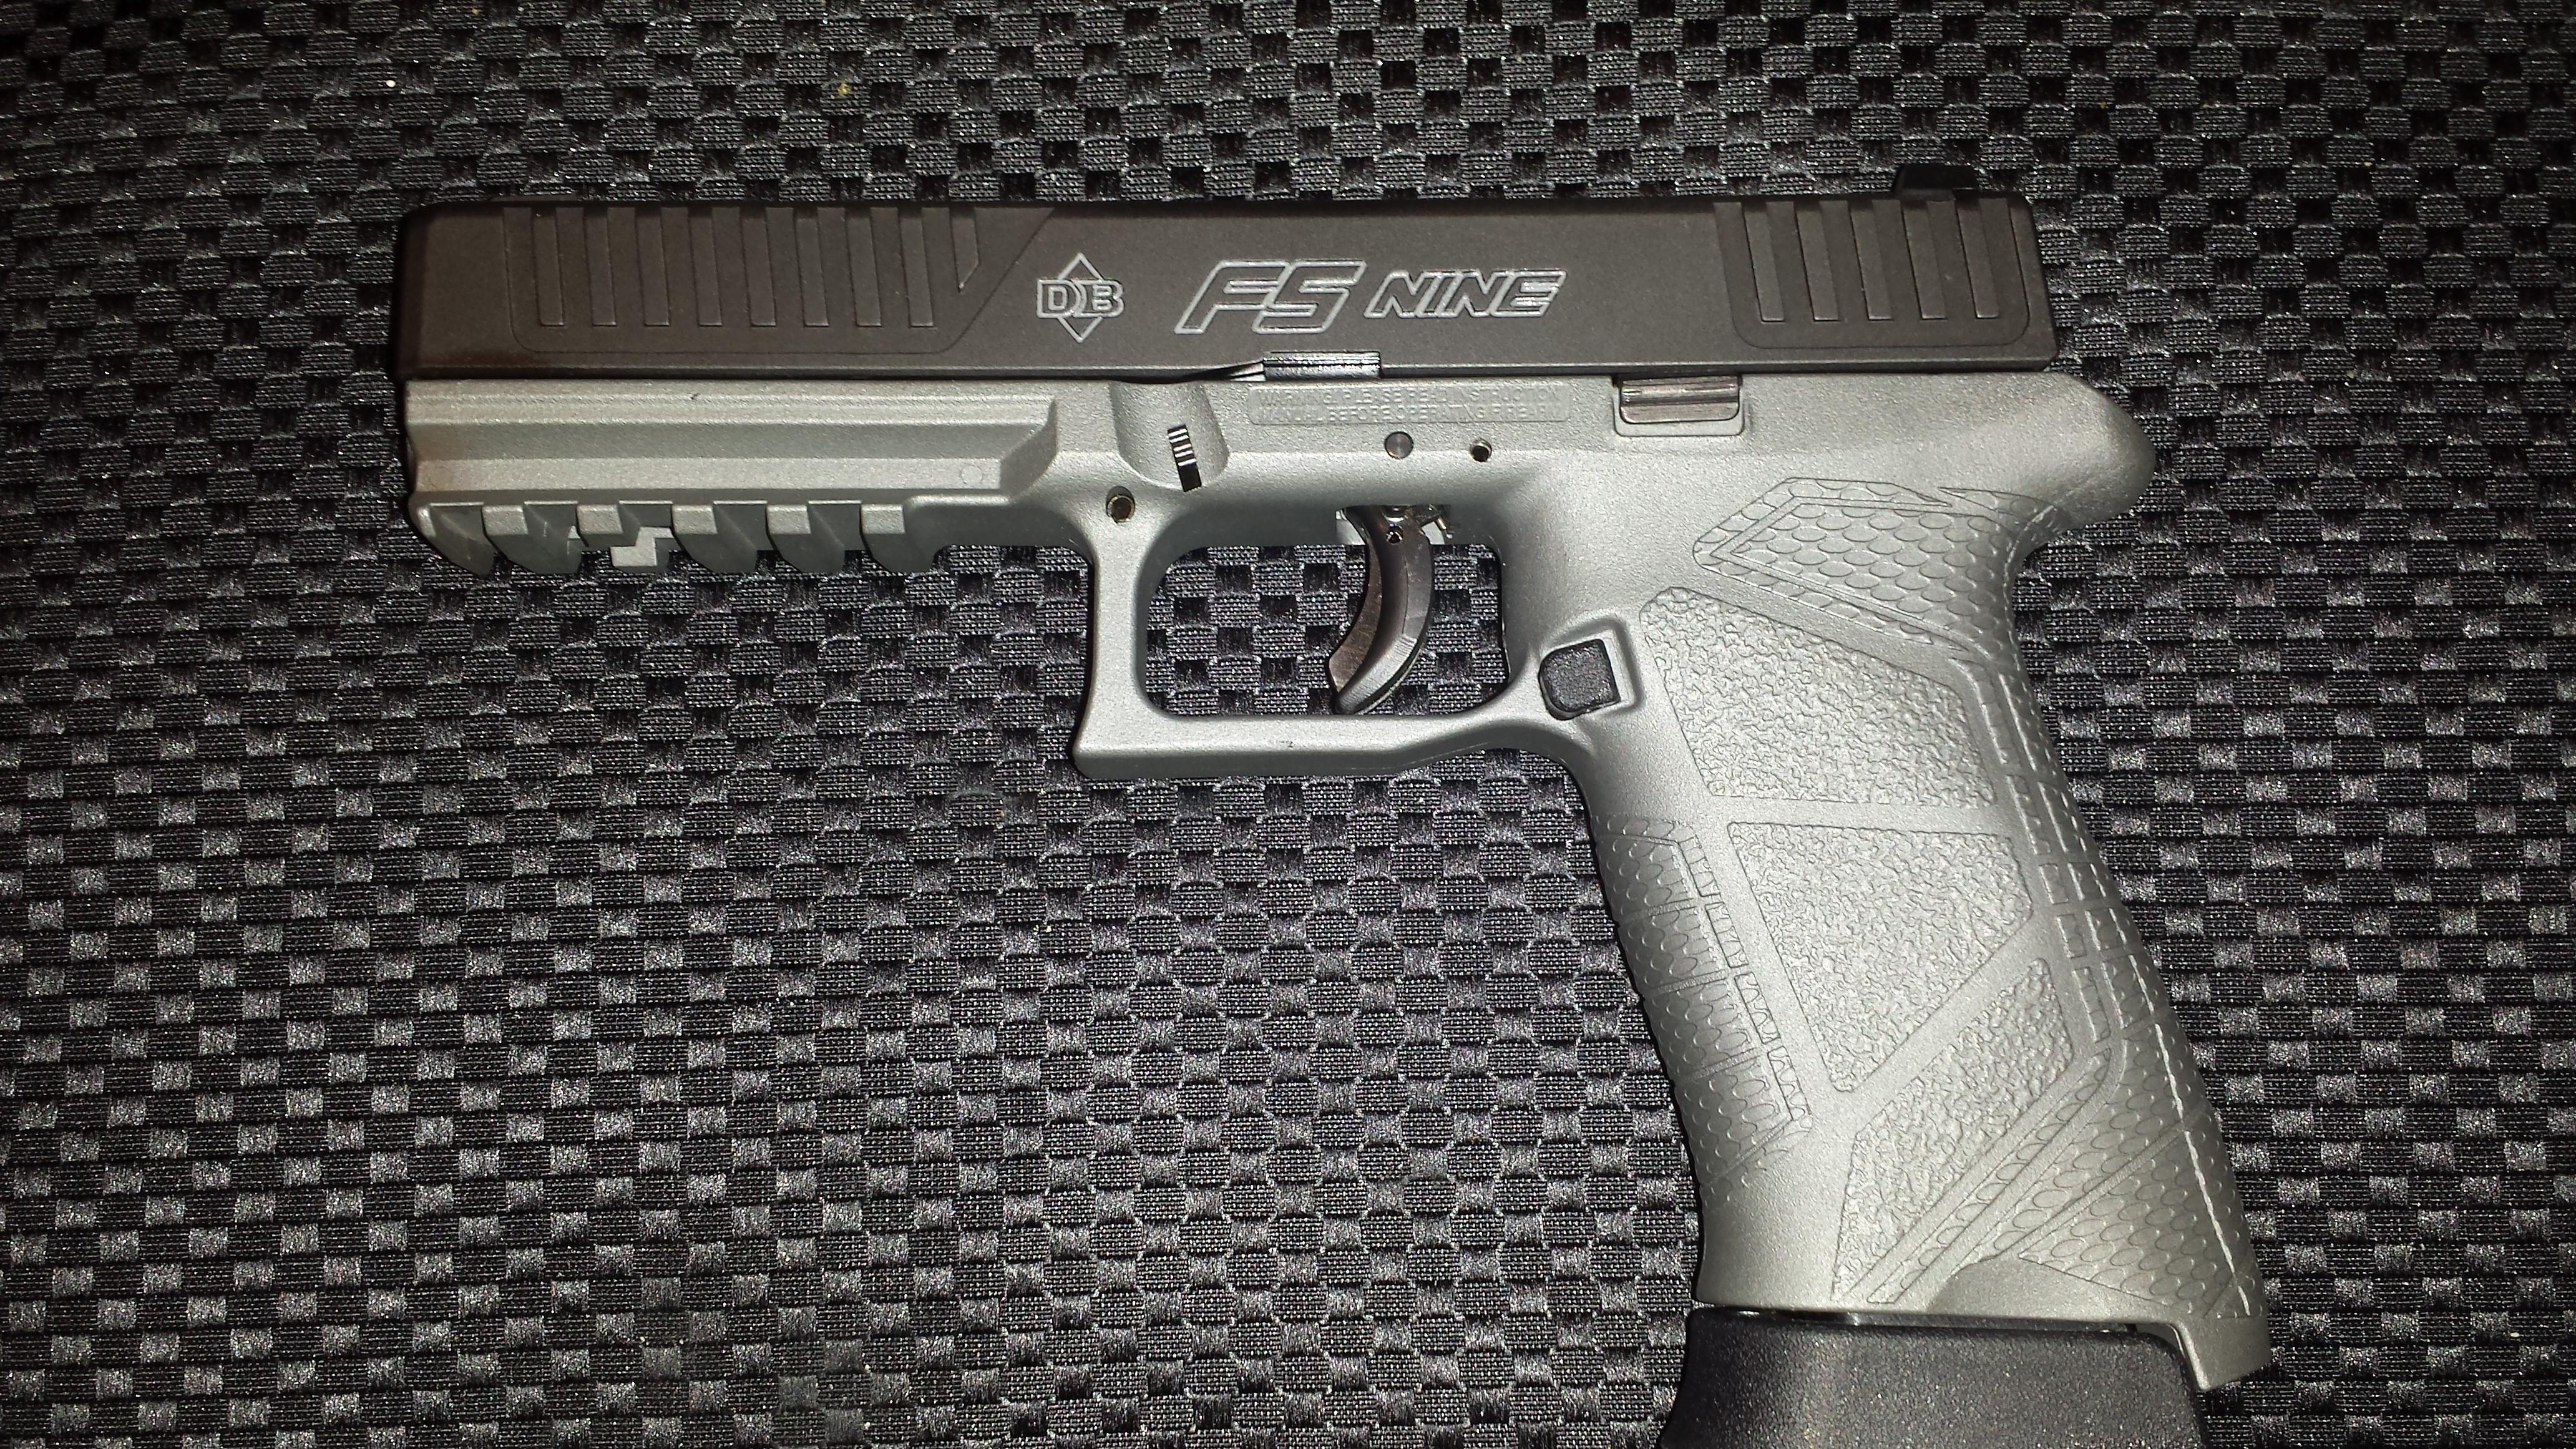 DIAMONDBACK FS 9mm